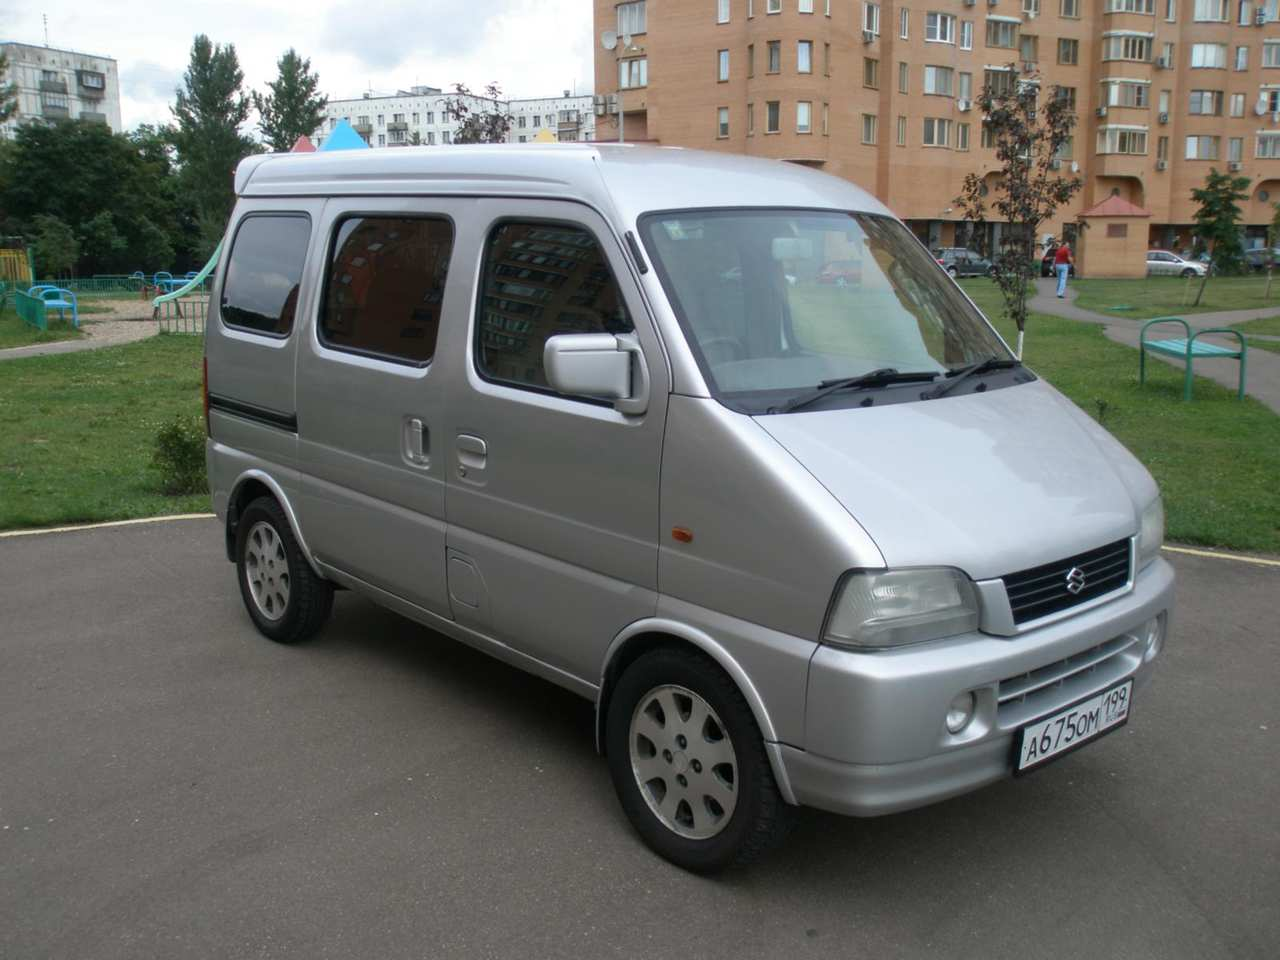 2000 Suzuki Every PLUS Pics 1 3 Gasoline FR or RR